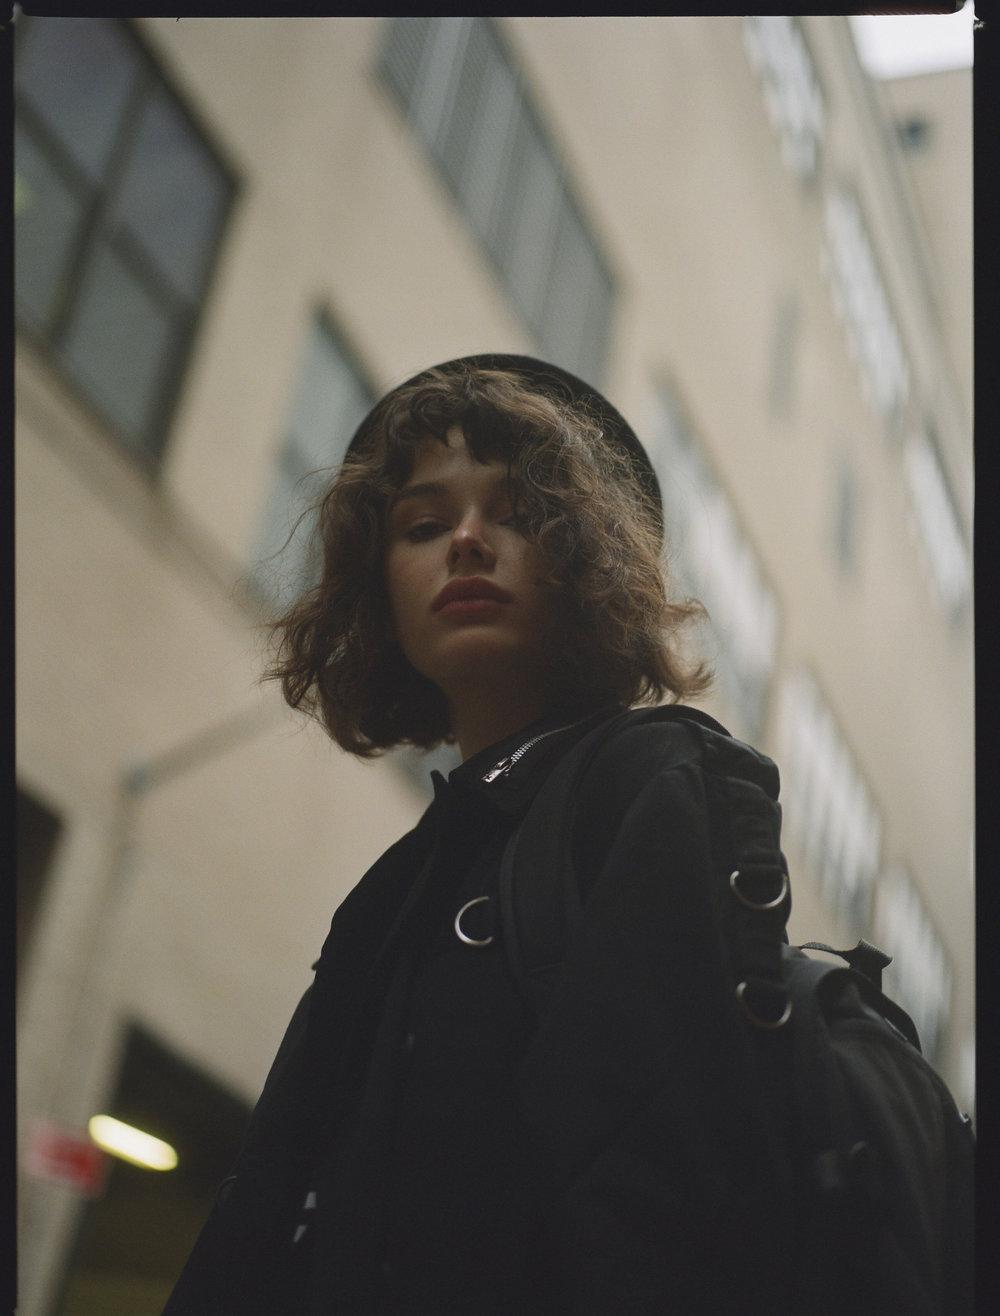 EMILY_LIPSON_STREETSTYLE_SELECTS10.JPG